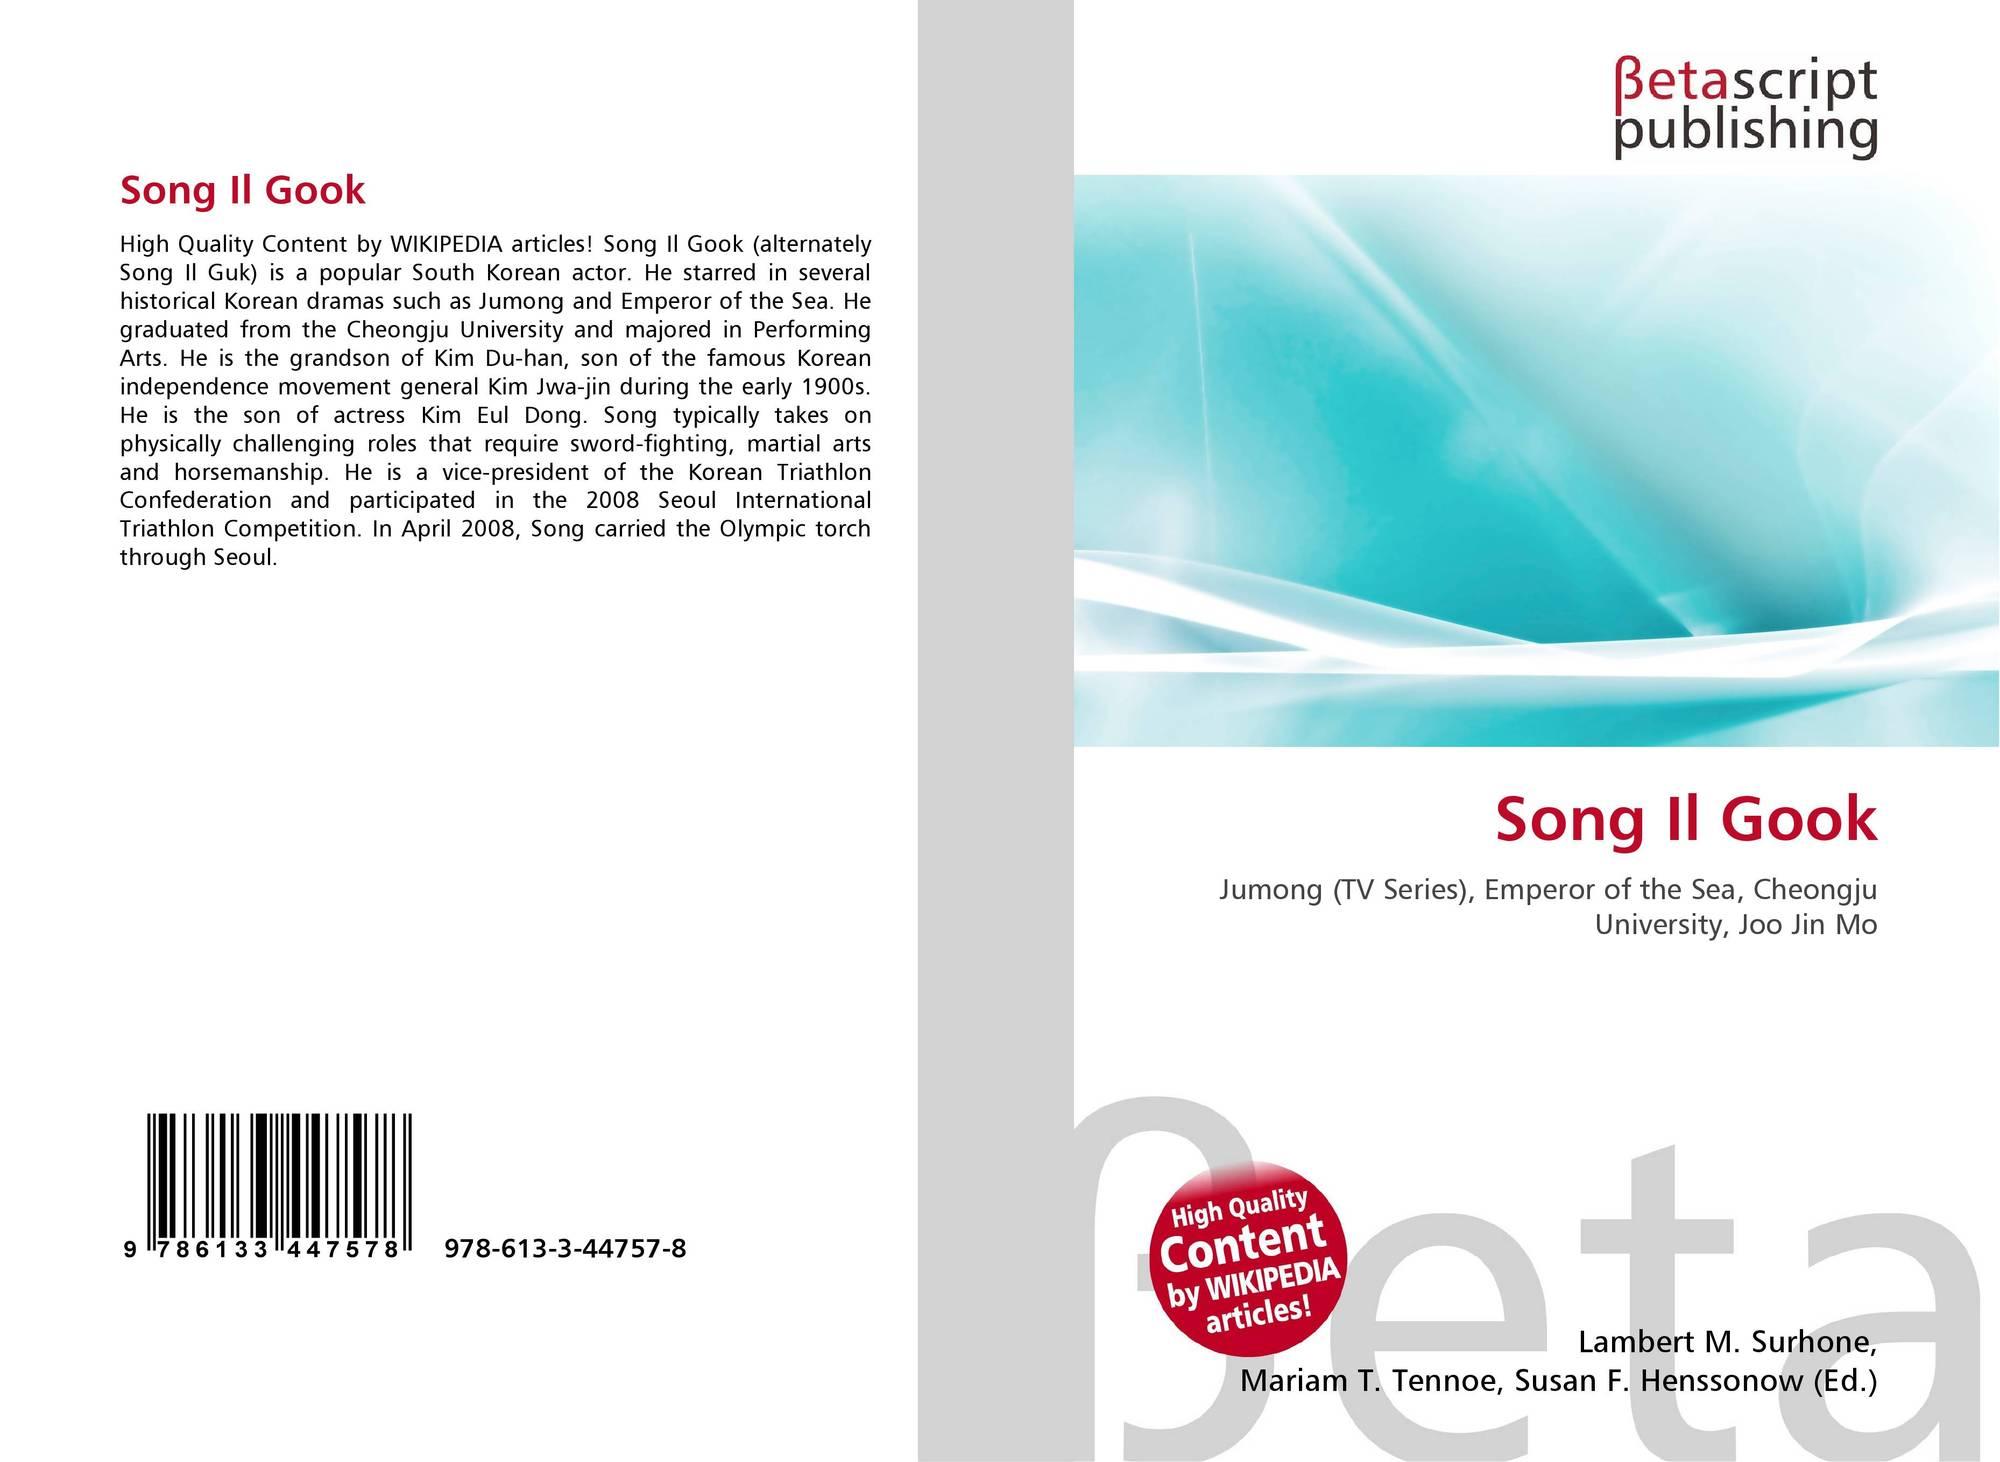 Song Il Gook, 978-613-3-44757-8, 6133447575 ,9786133447578